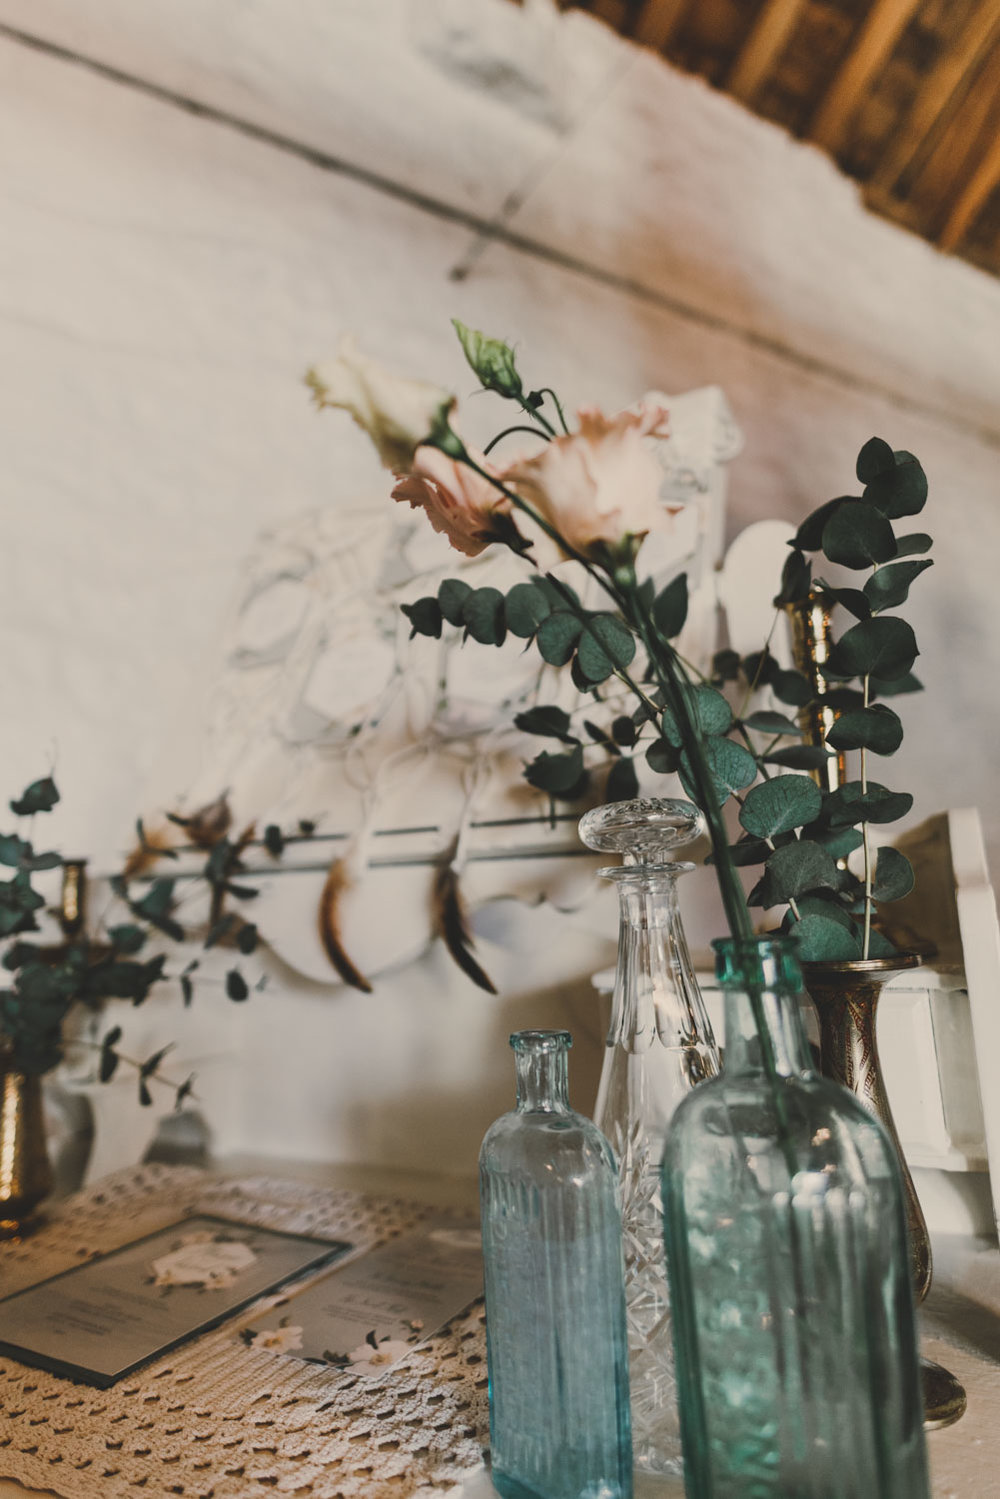 east-riddlesden-hall-wedding-jade-maguire-photography (6).jpg